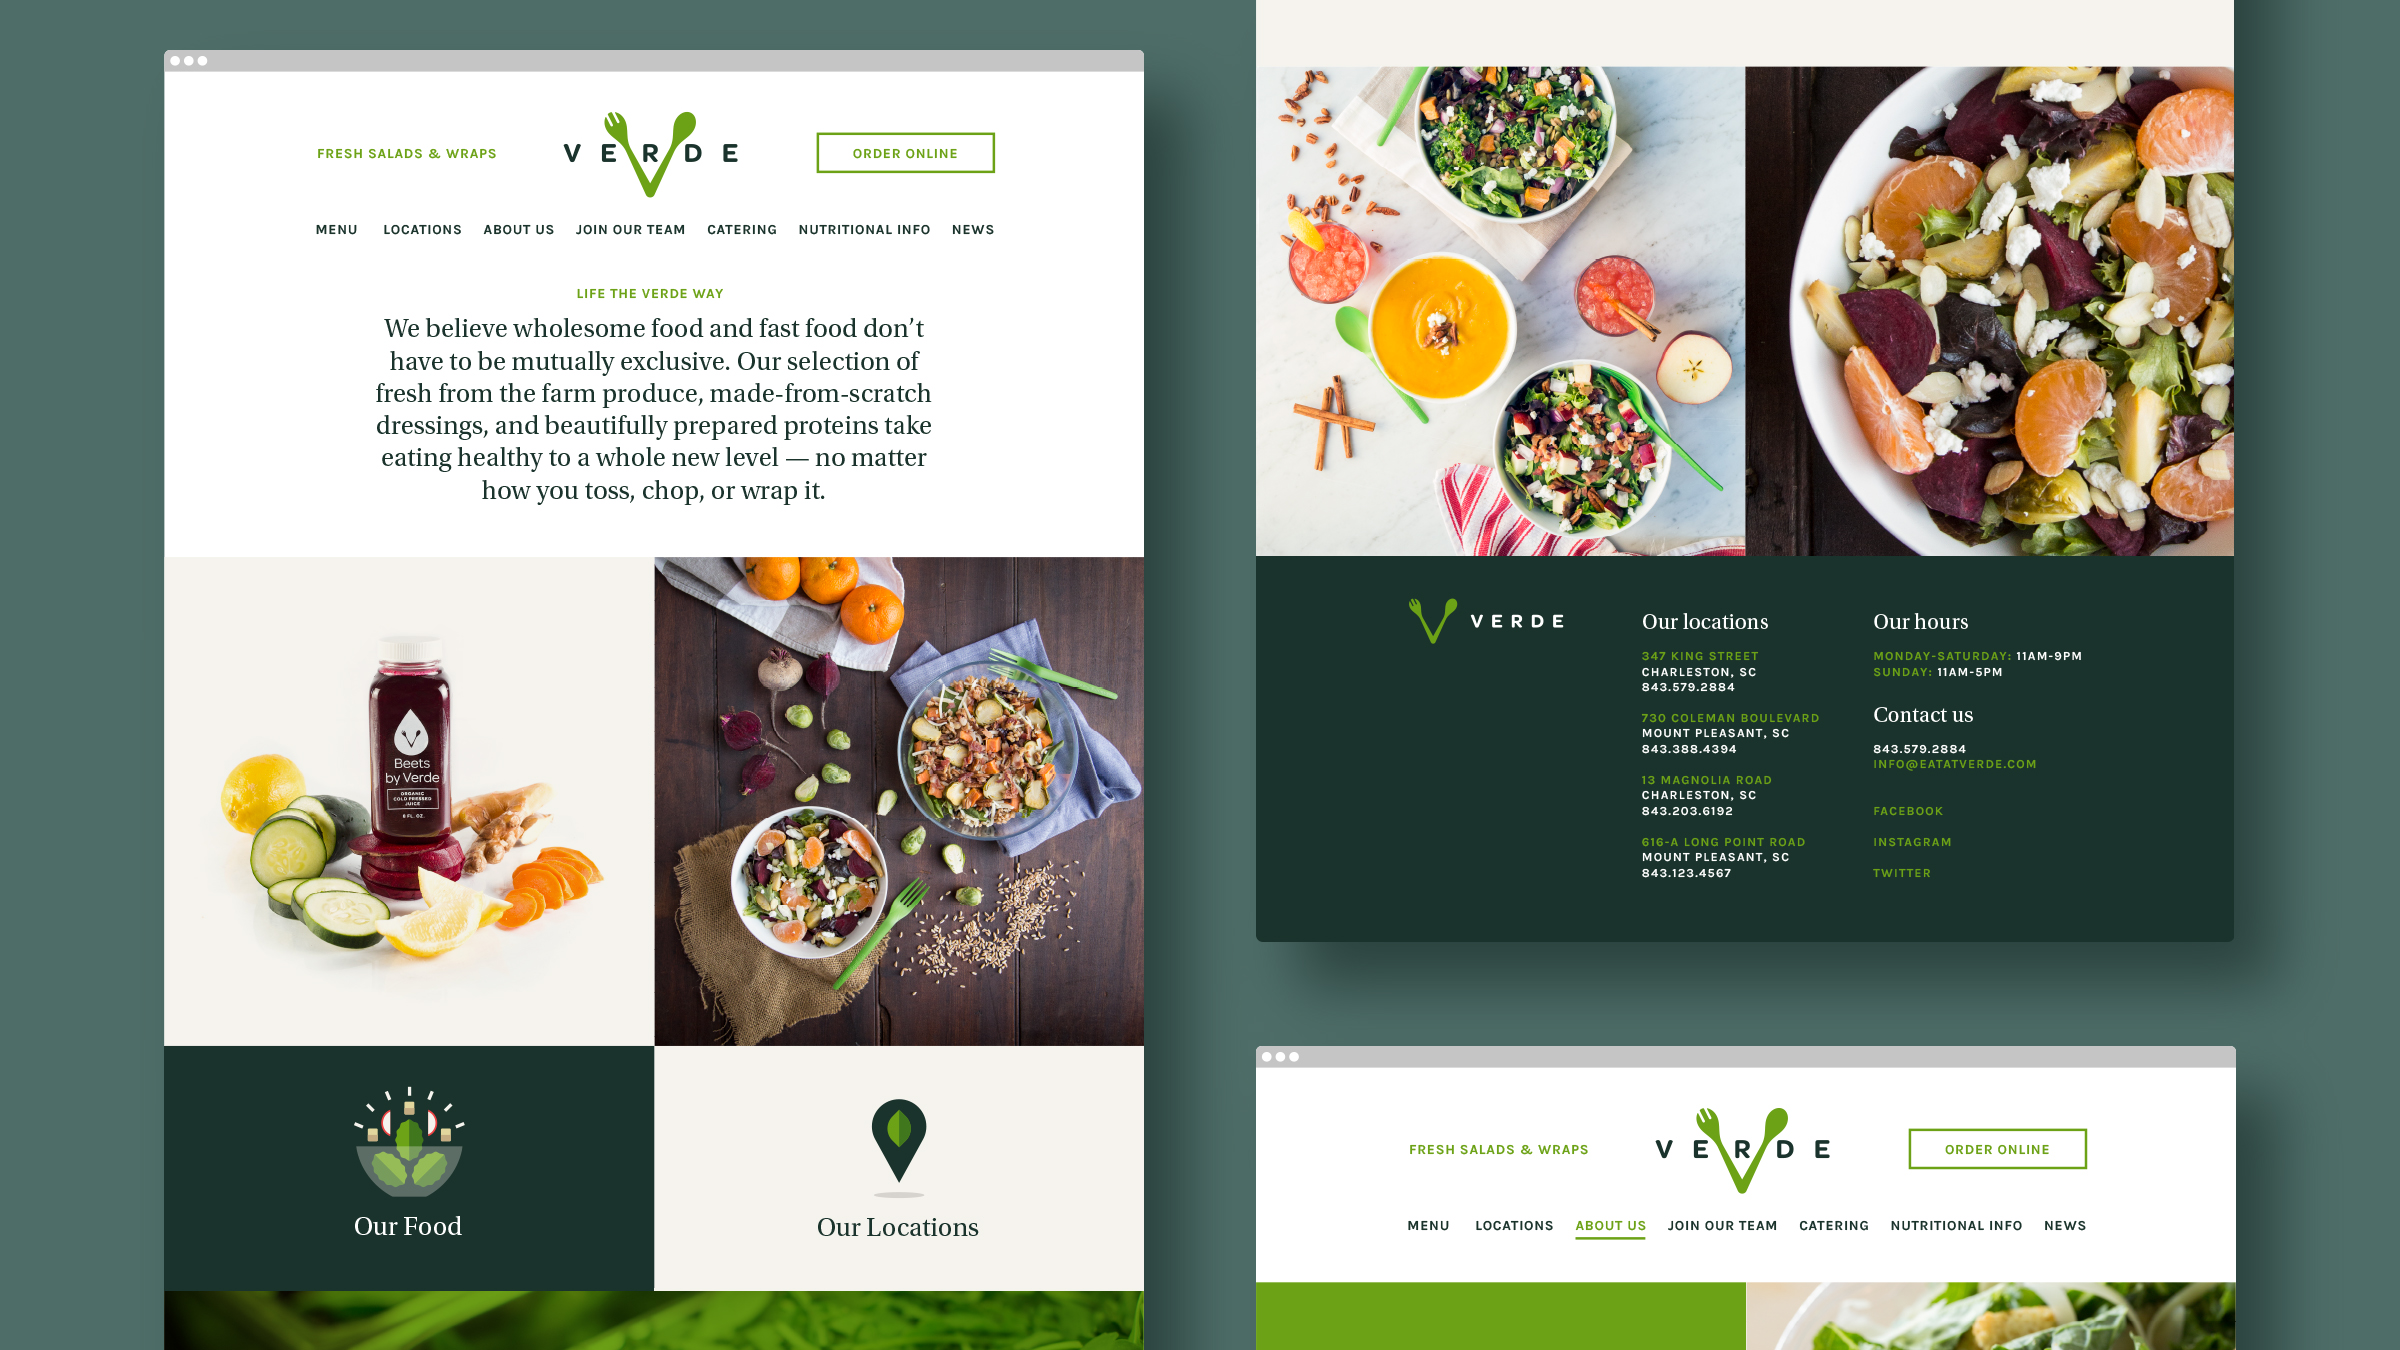 Verde Salad Restaurant Website Design